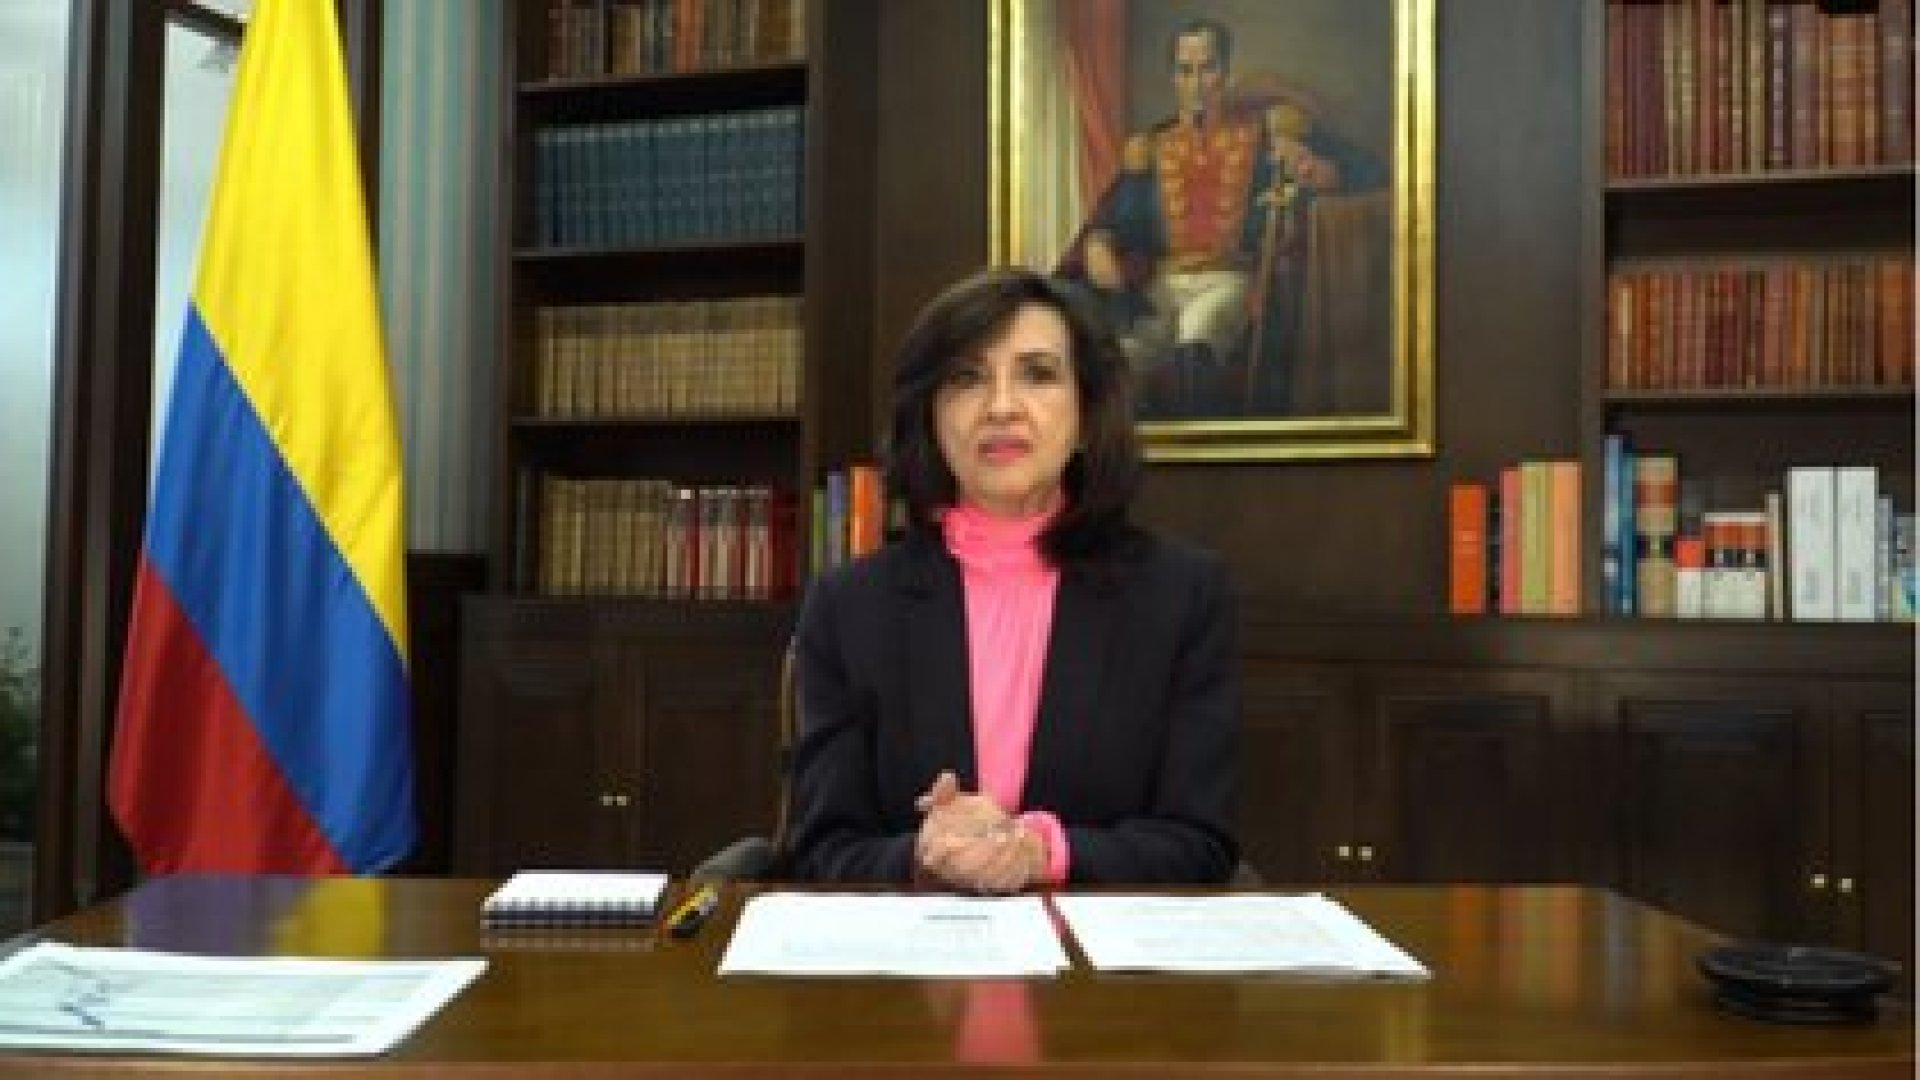 La Ministra de Relaciones Exteriores de Colombia, Claudia Blum